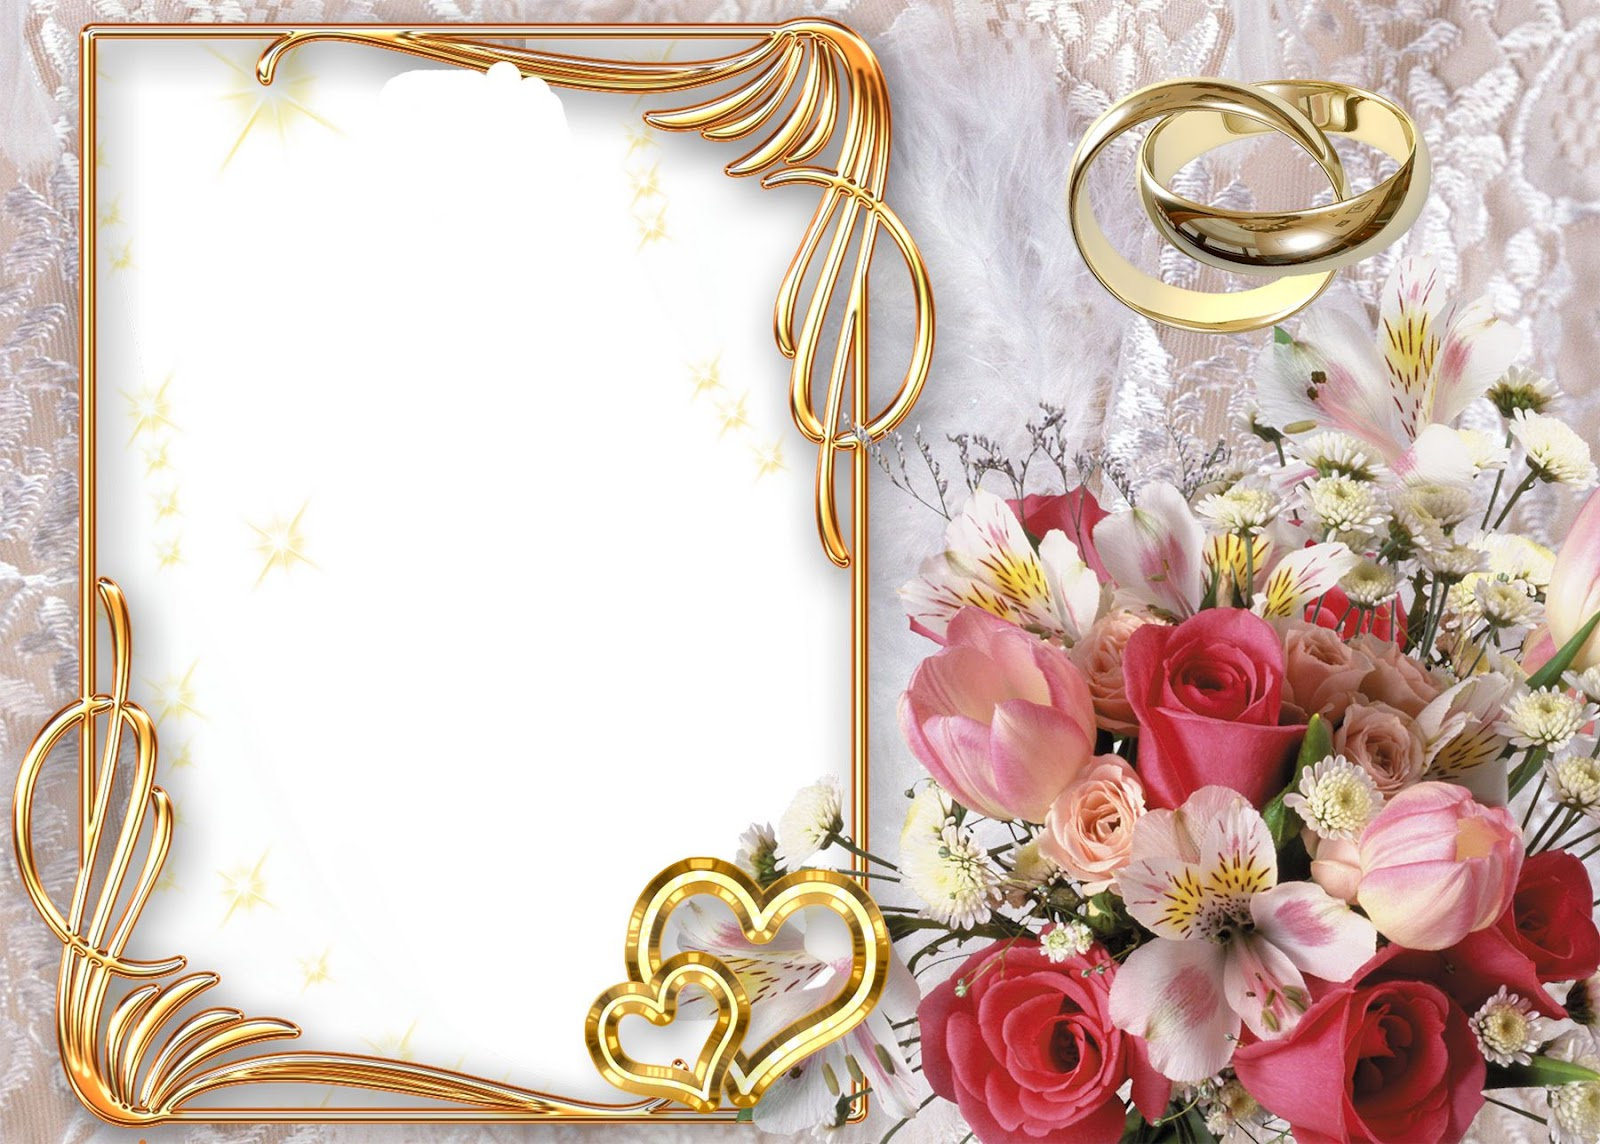 cadre photofiltre mariage cool cadre pour montage photofiltre cadres pour s cadre pour miroir. Black Bedroom Furniture Sets. Home Design Ideas